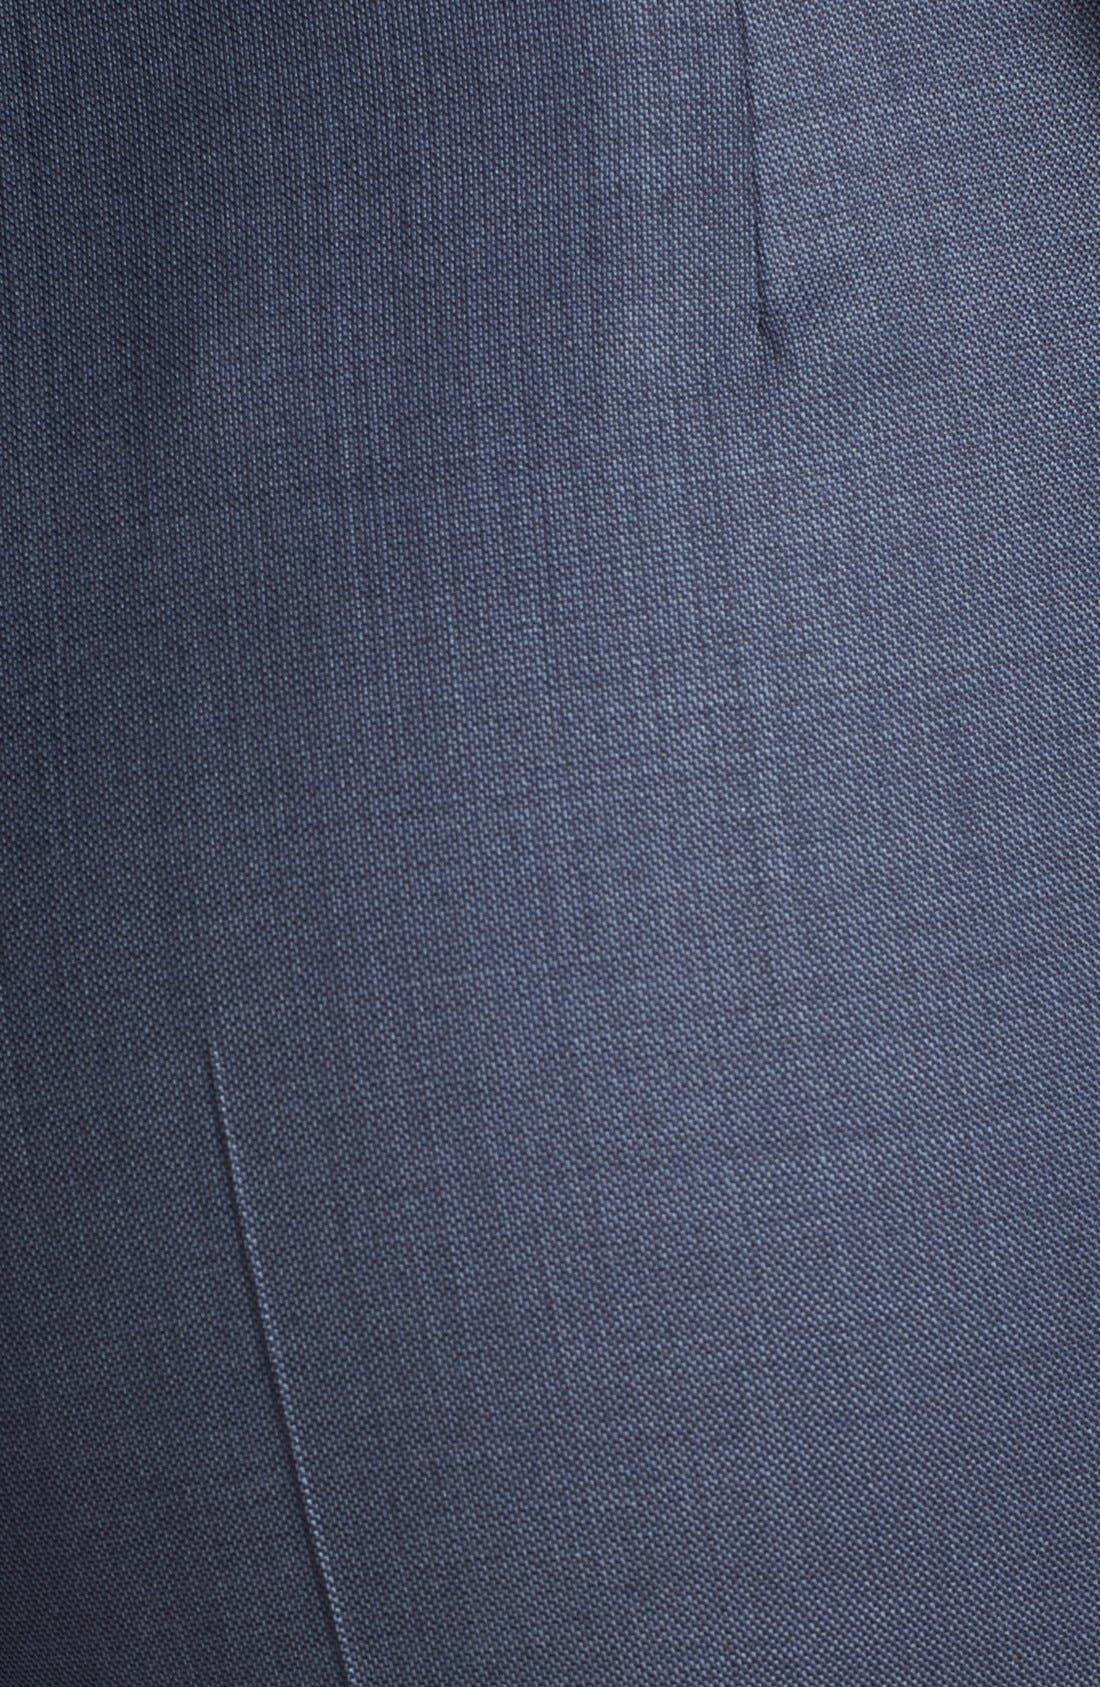 'Temuna' Wool Blend Suiting Trousers,                             Alternate thumbnail 6, color,                             463